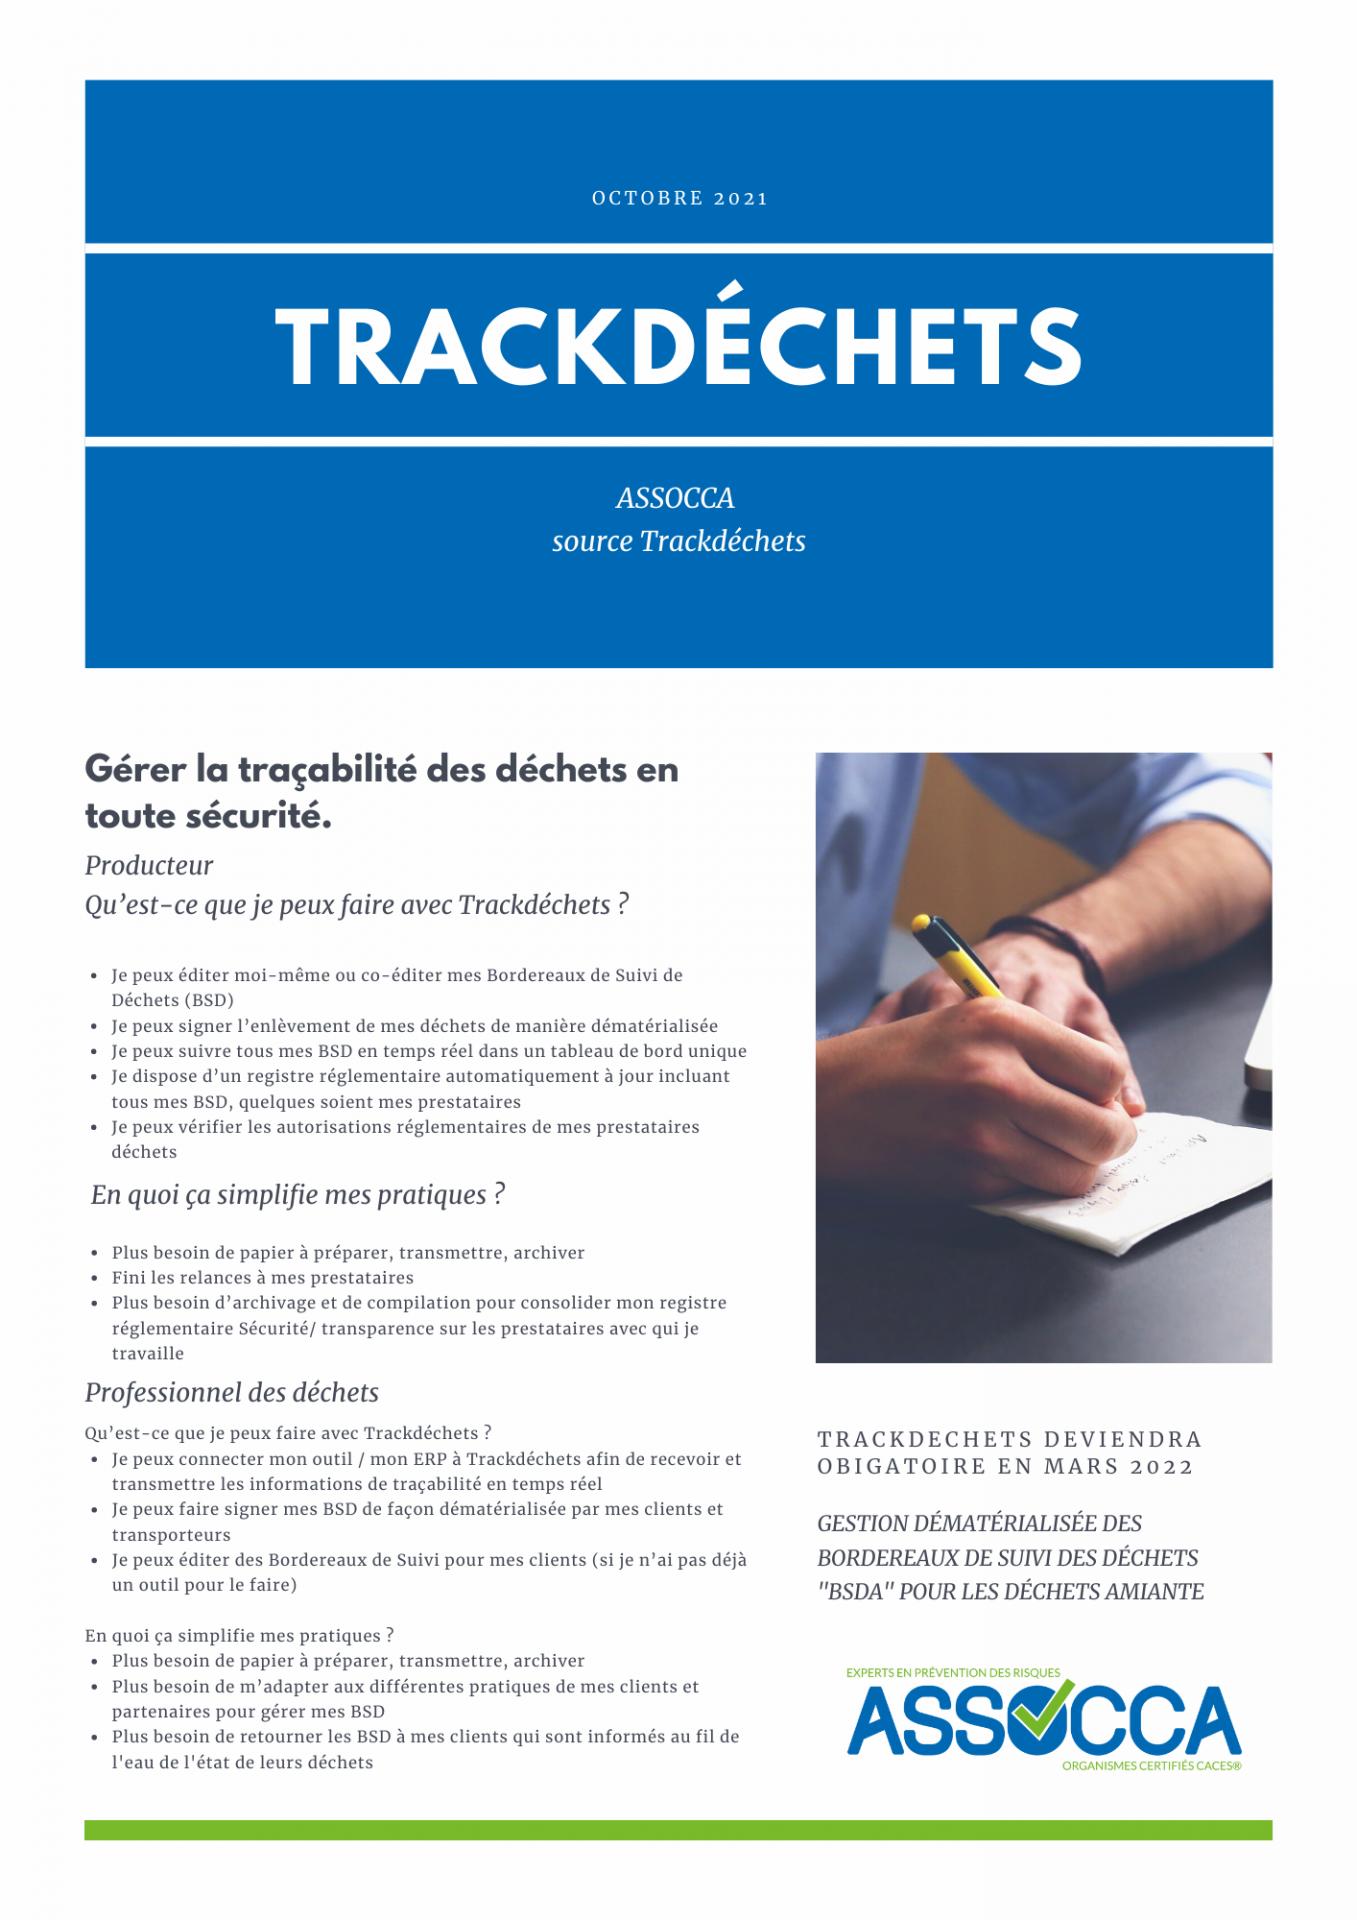 Trackde chets